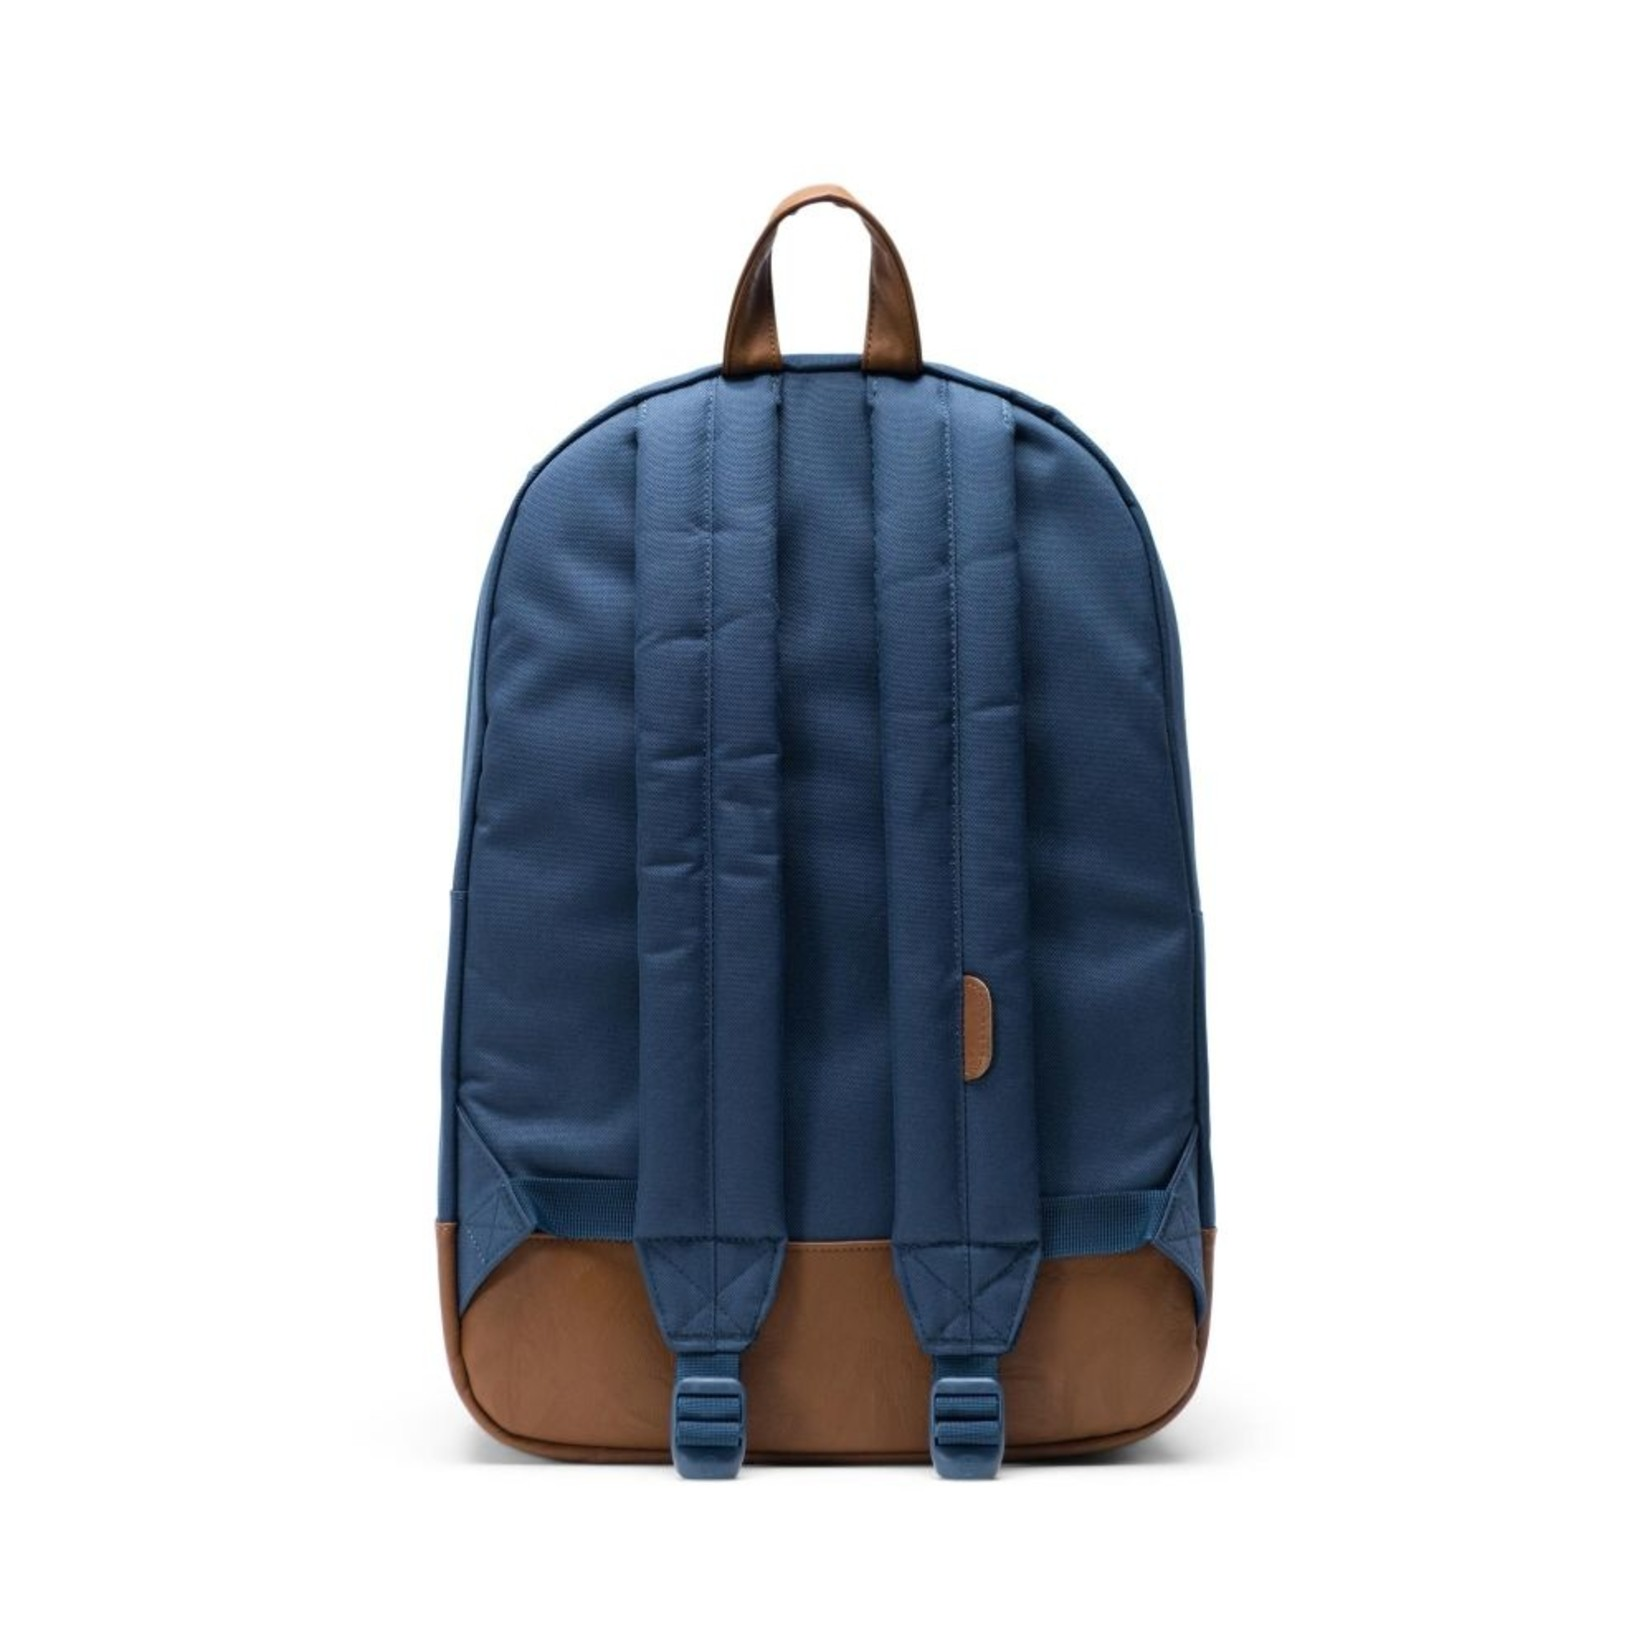 Herschel Supply CO. Herschel Supply CO. Heritage  Backpack